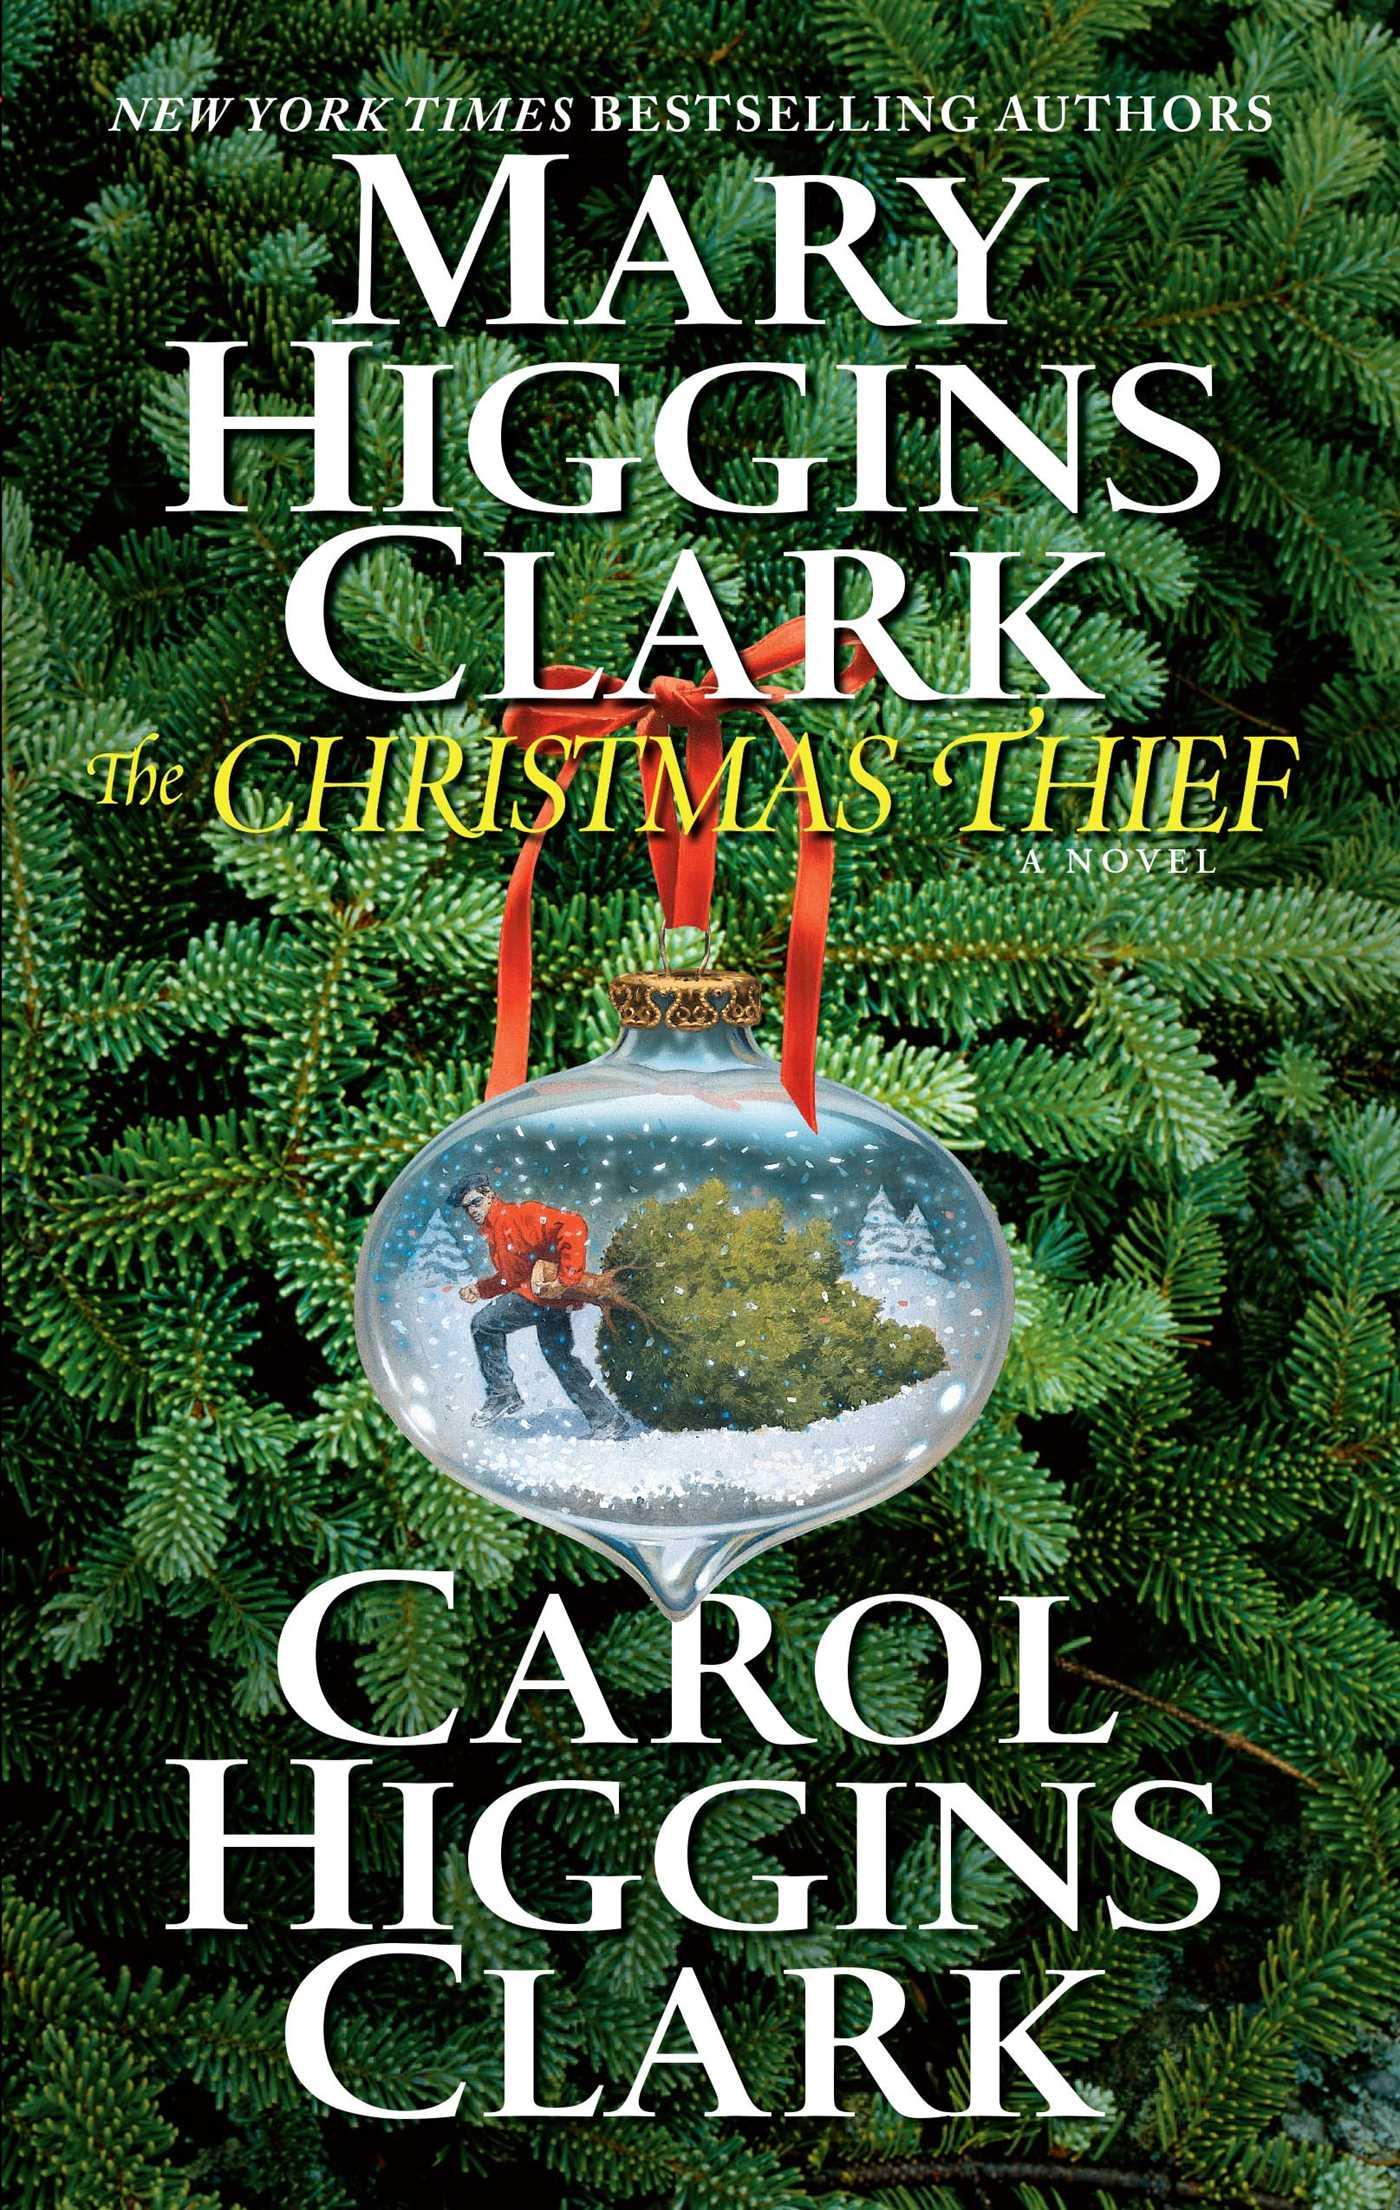 The christmas thief 9781439173077 hr